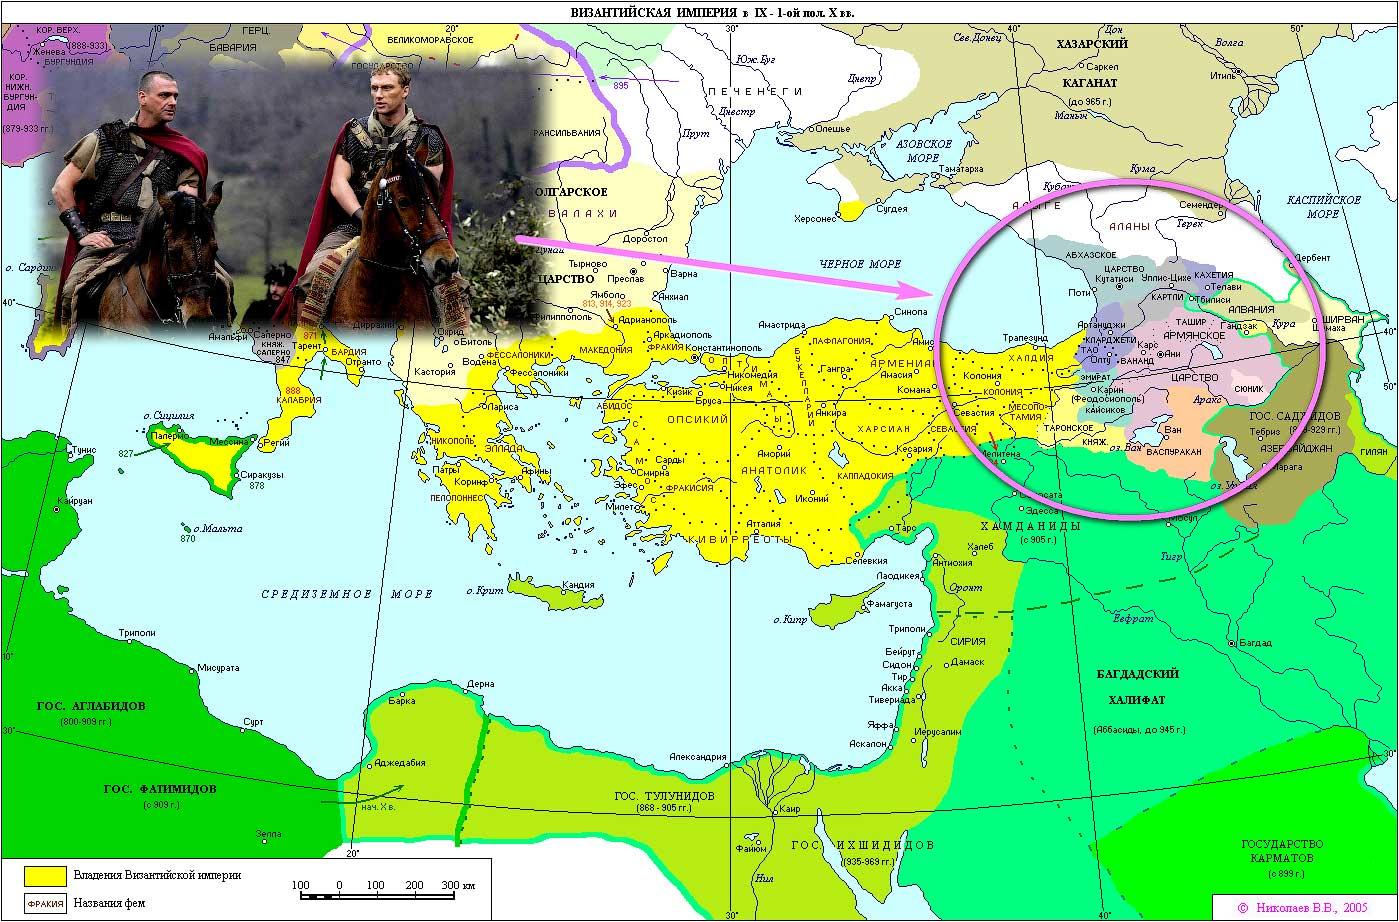 Карта границ Византии в IX и 2-ой половине X века